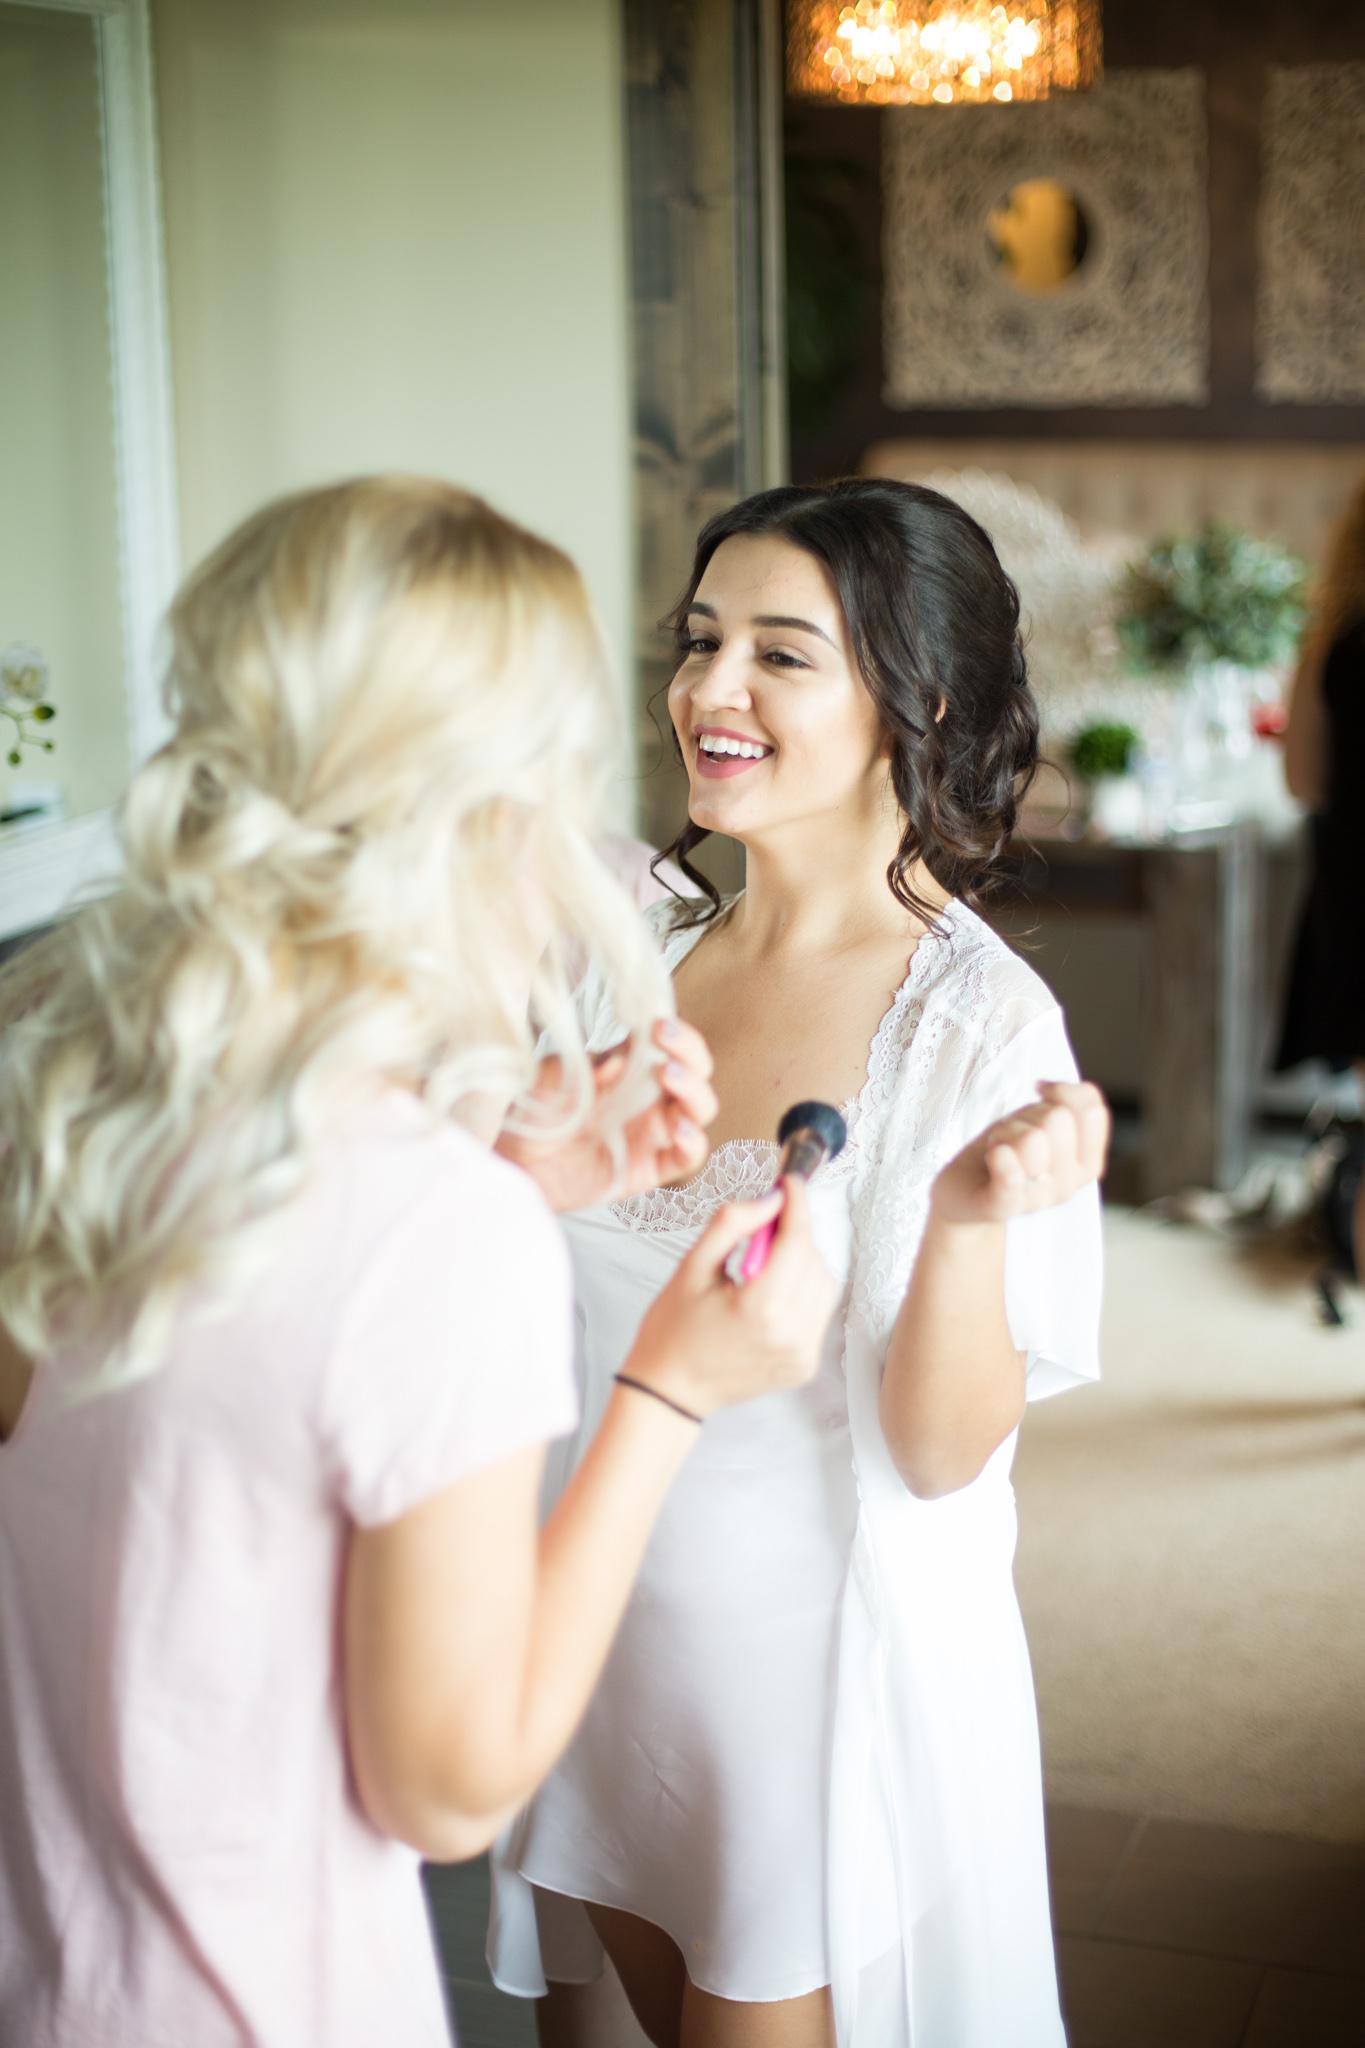 Olga_janni_wedding_090917_WEBSIZE (3 of 704).JPG